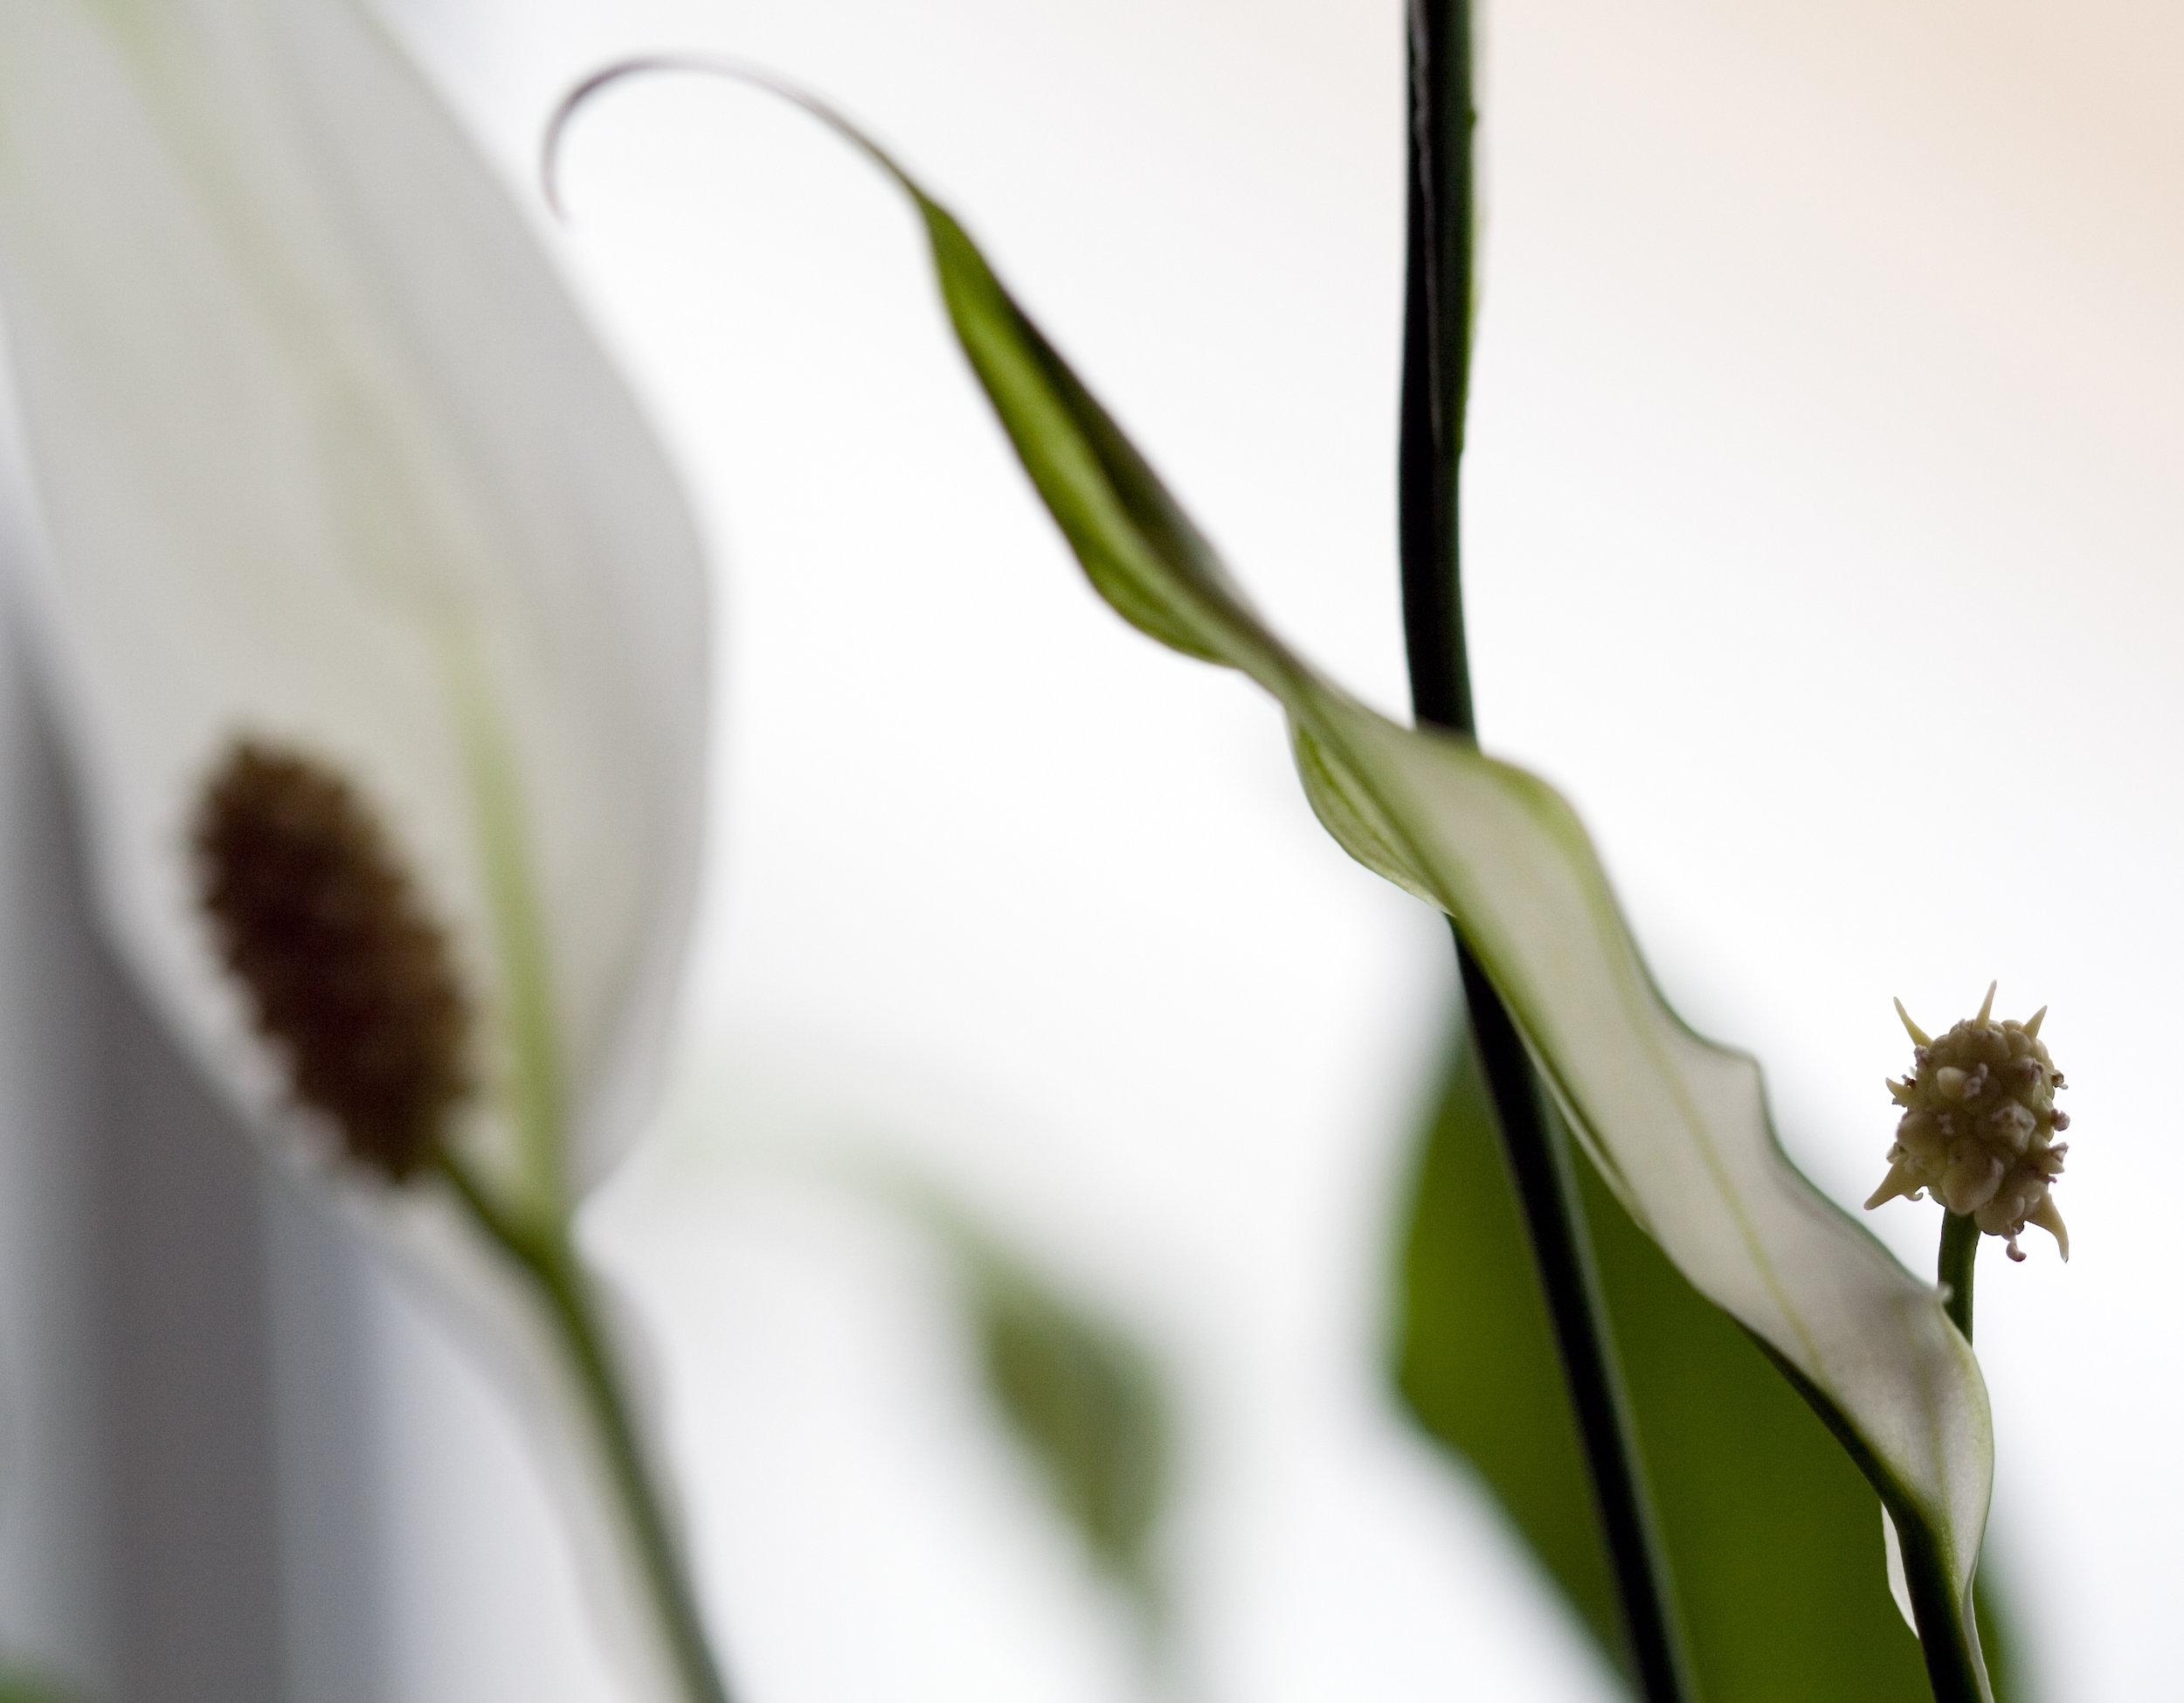 uwm.plants.peacelily